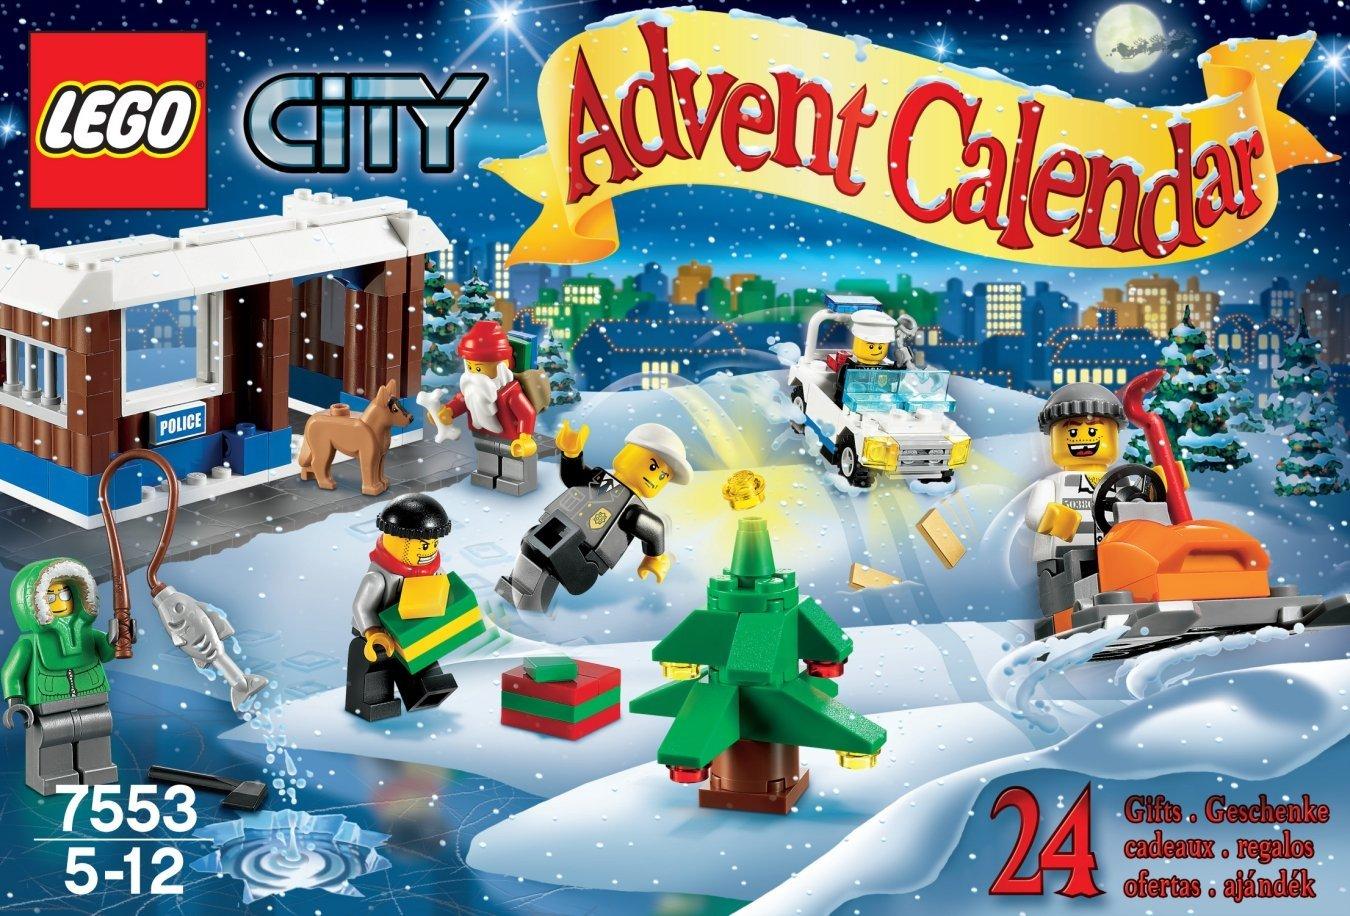 7553 le calendrier de l 39 avent city wiki lego fandom powered by wikia - Adventskalender duplo ...